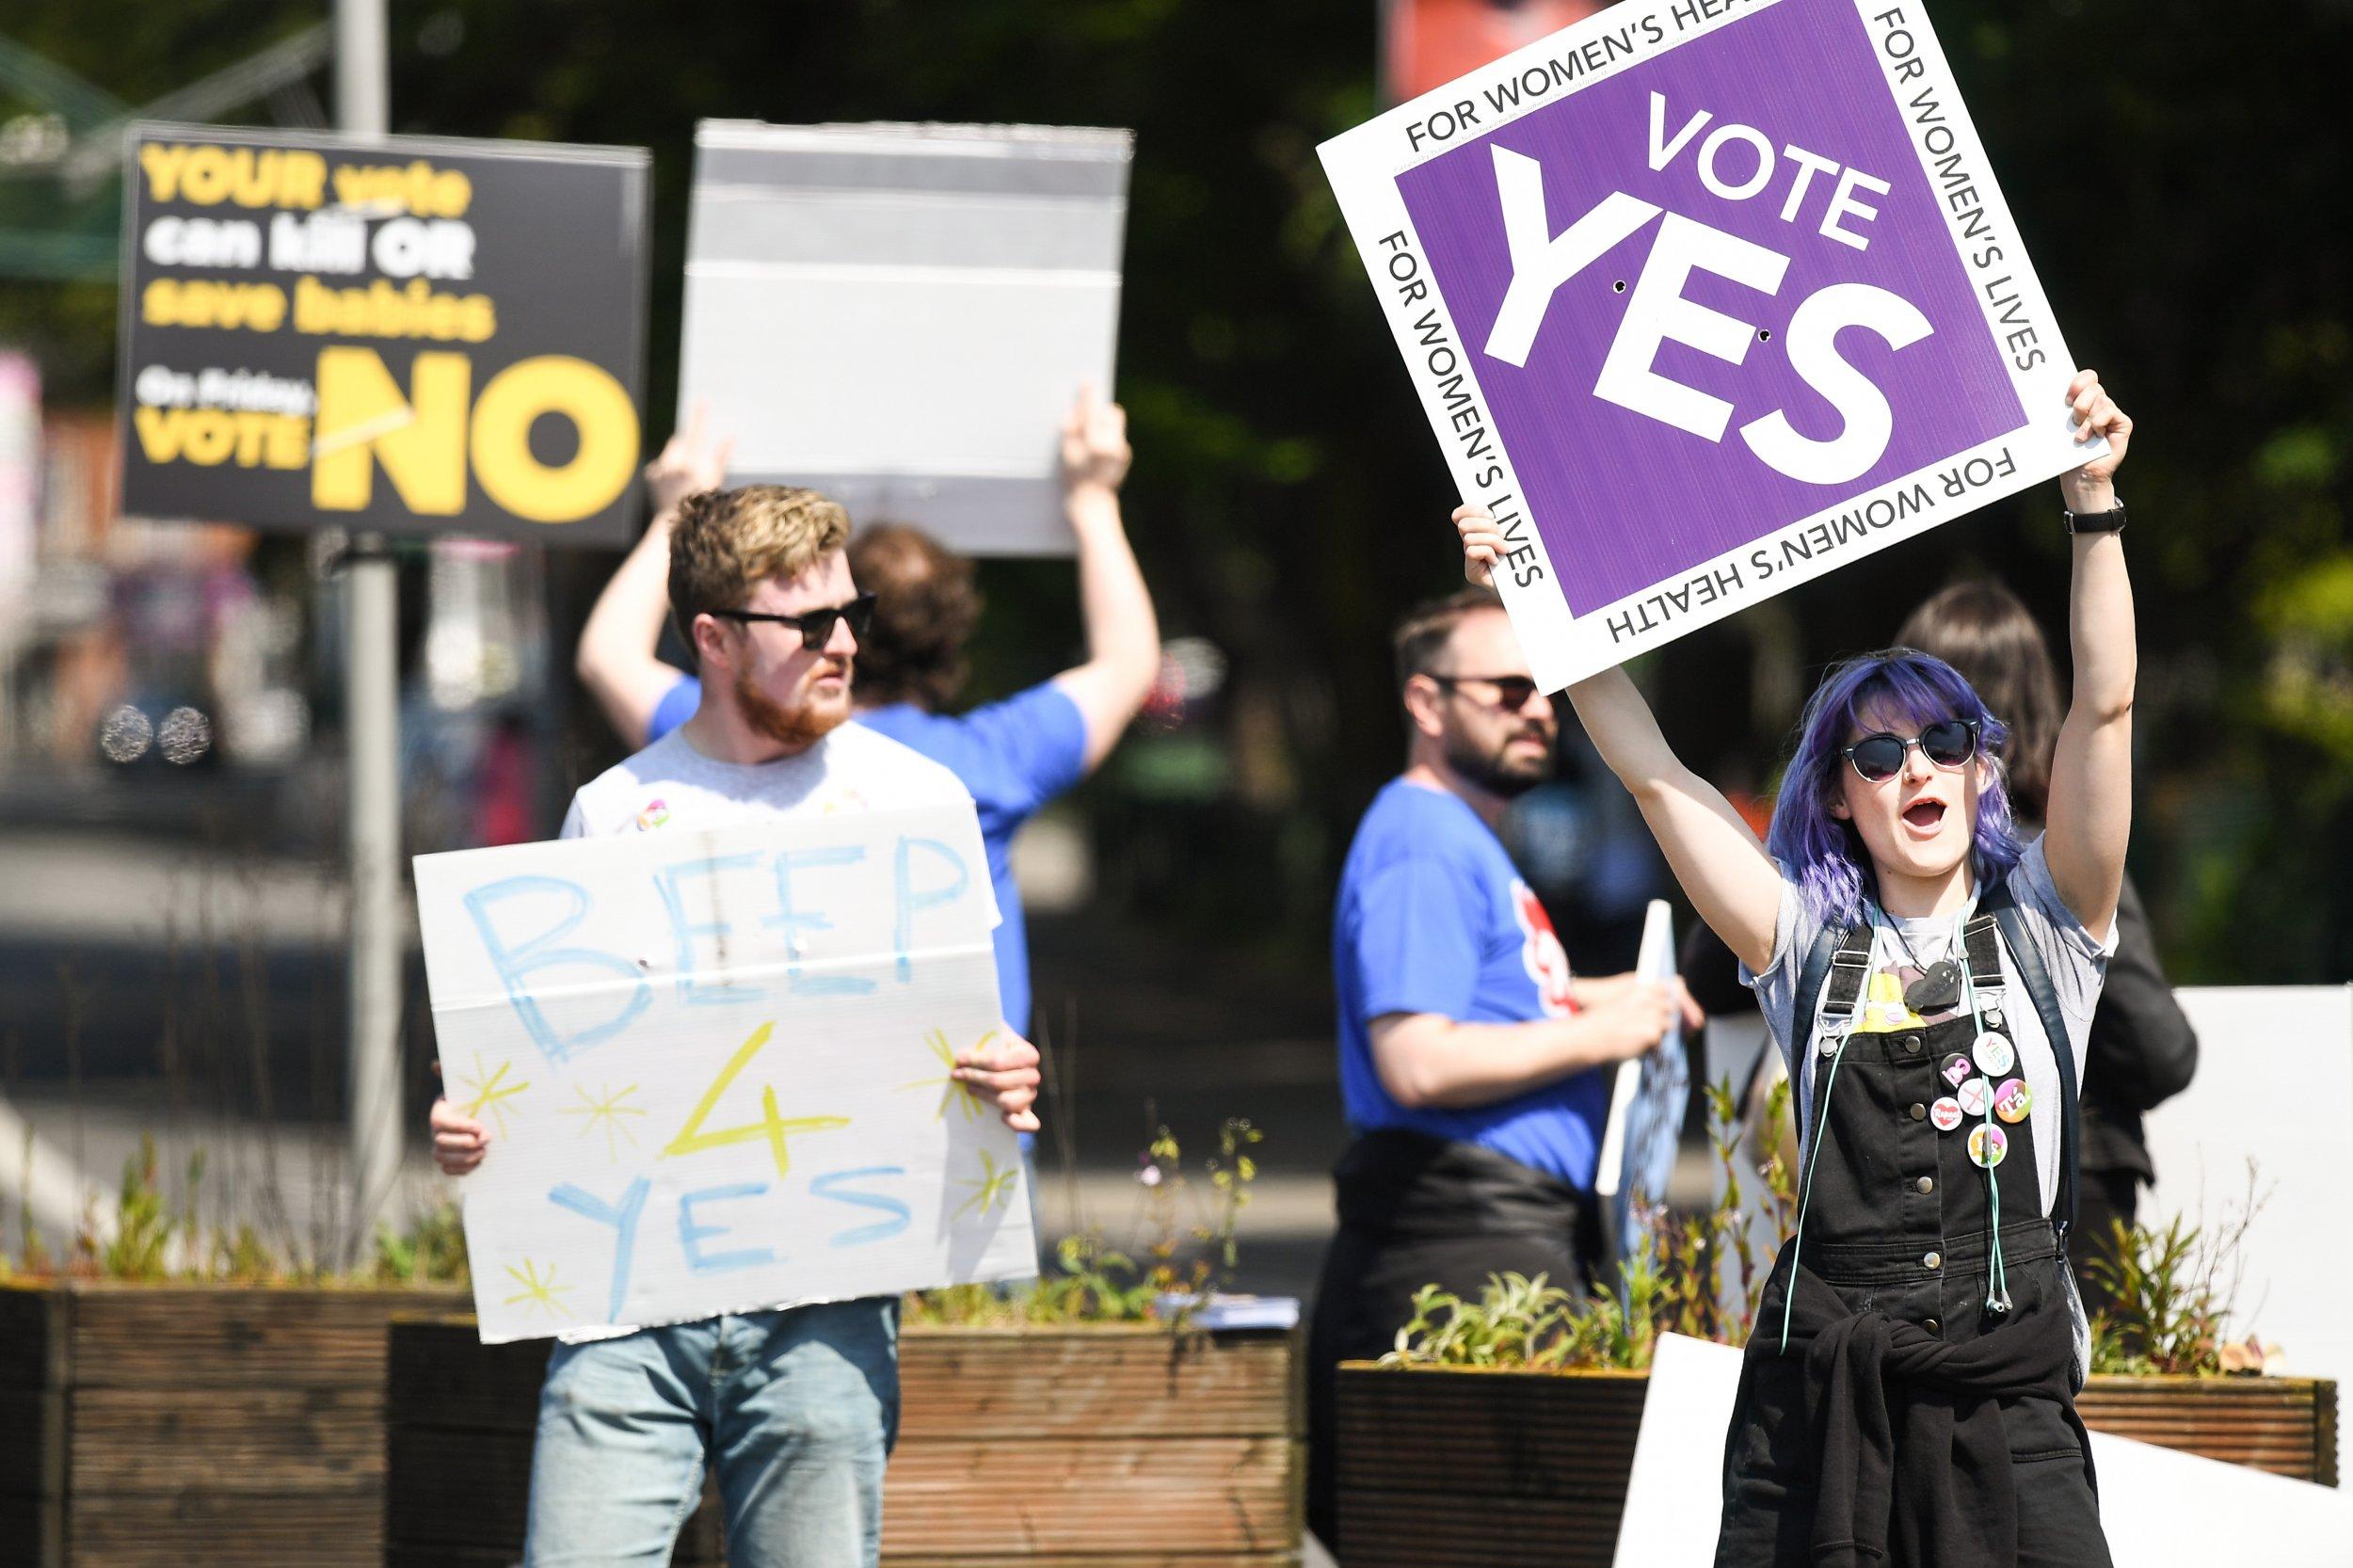 05_25_Ireland_Referendum